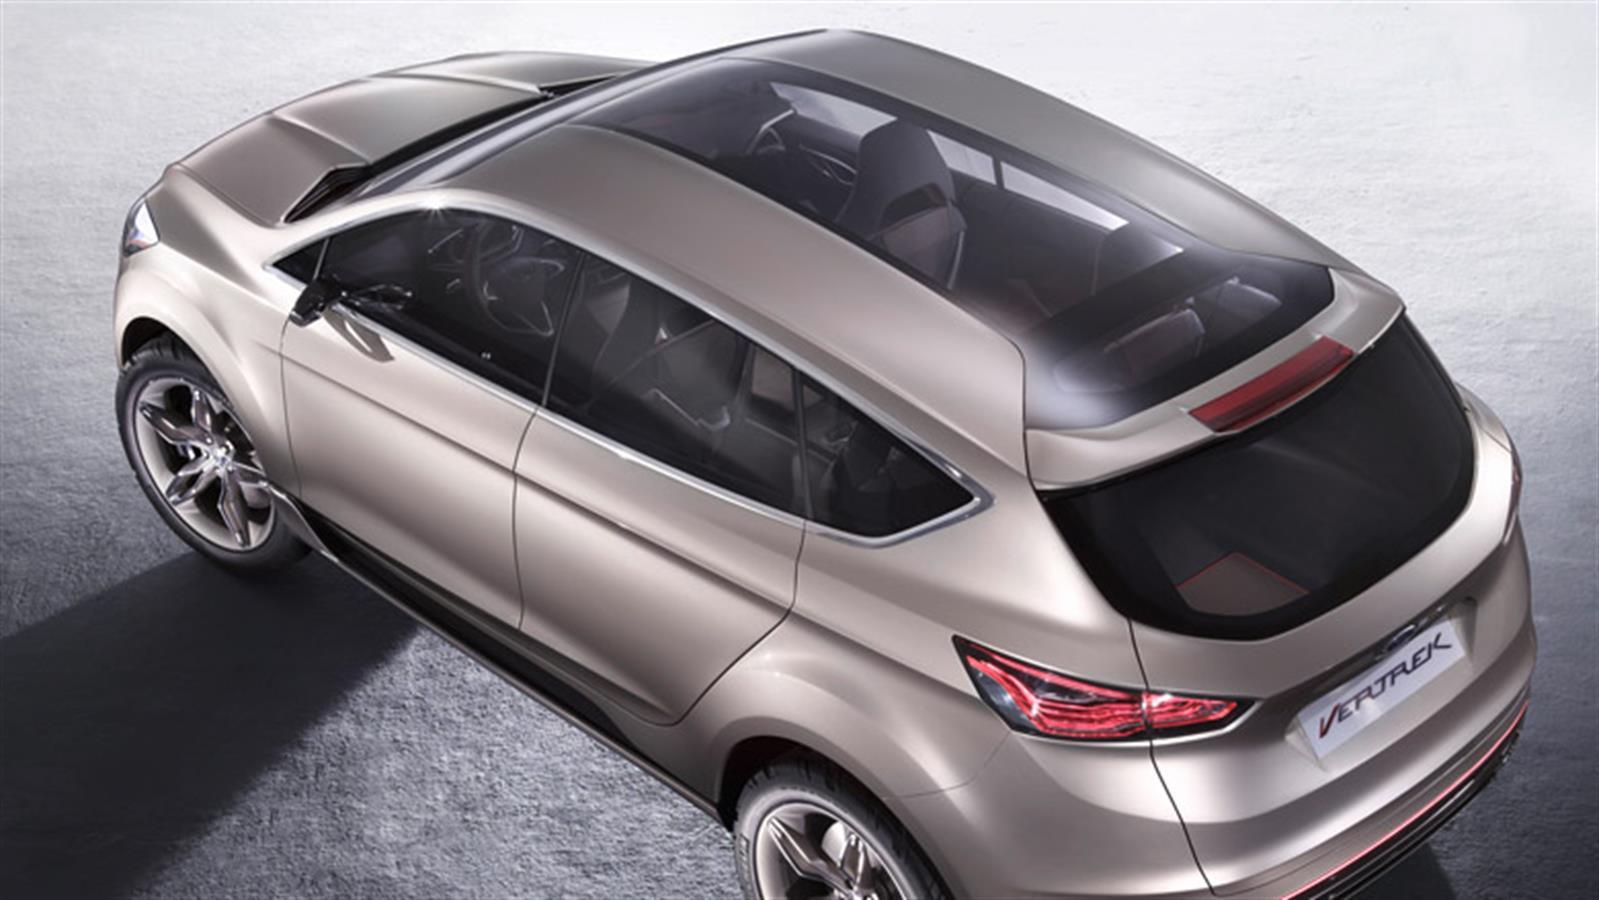 Garage schmit fils carrosserie d bosselage auto editus for Garage pare brise agree macif